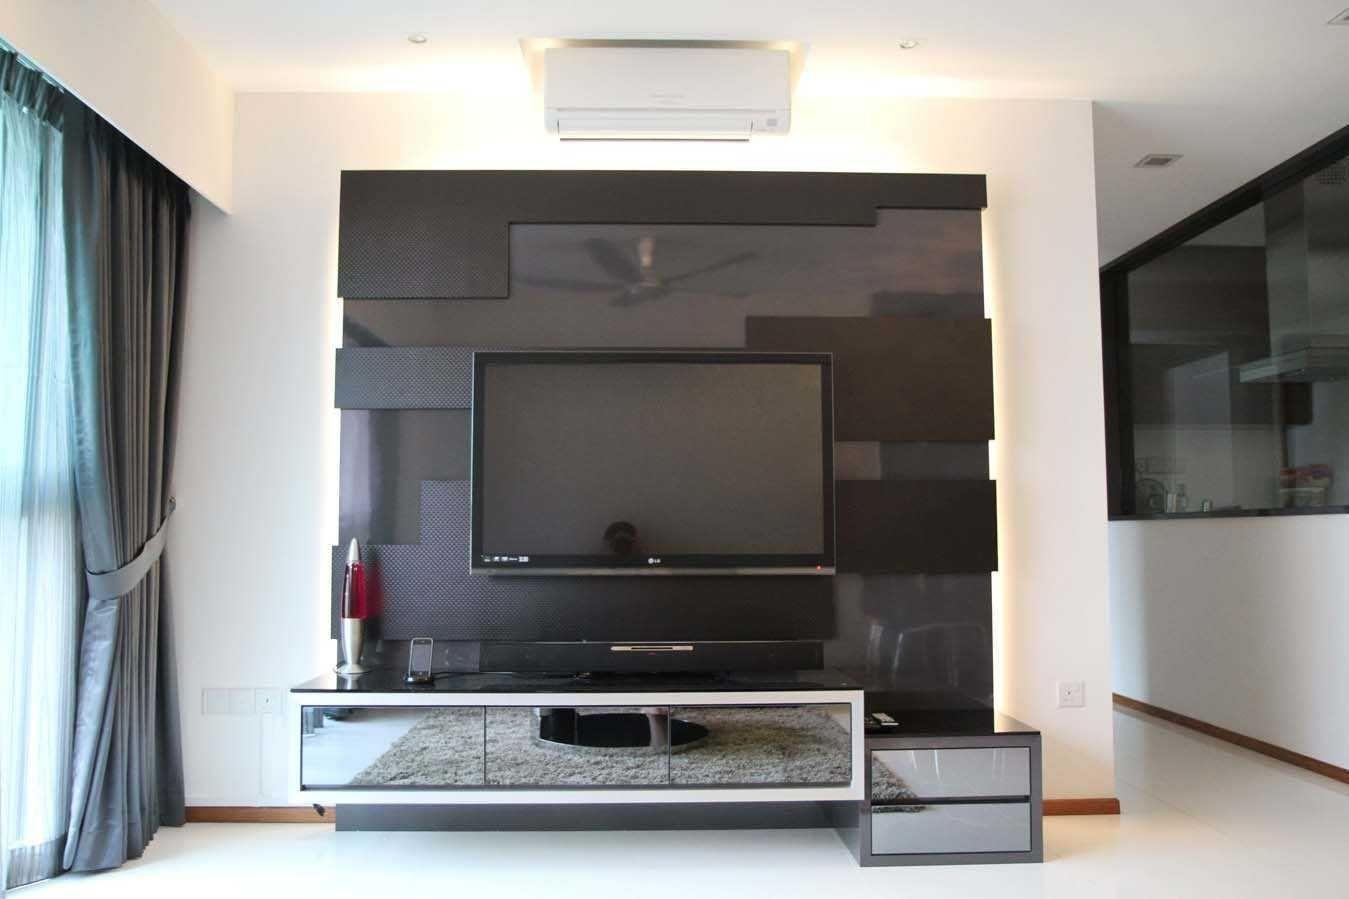 bedroom wall unit designs. Tv Wall Unit Designs For Bedroom G